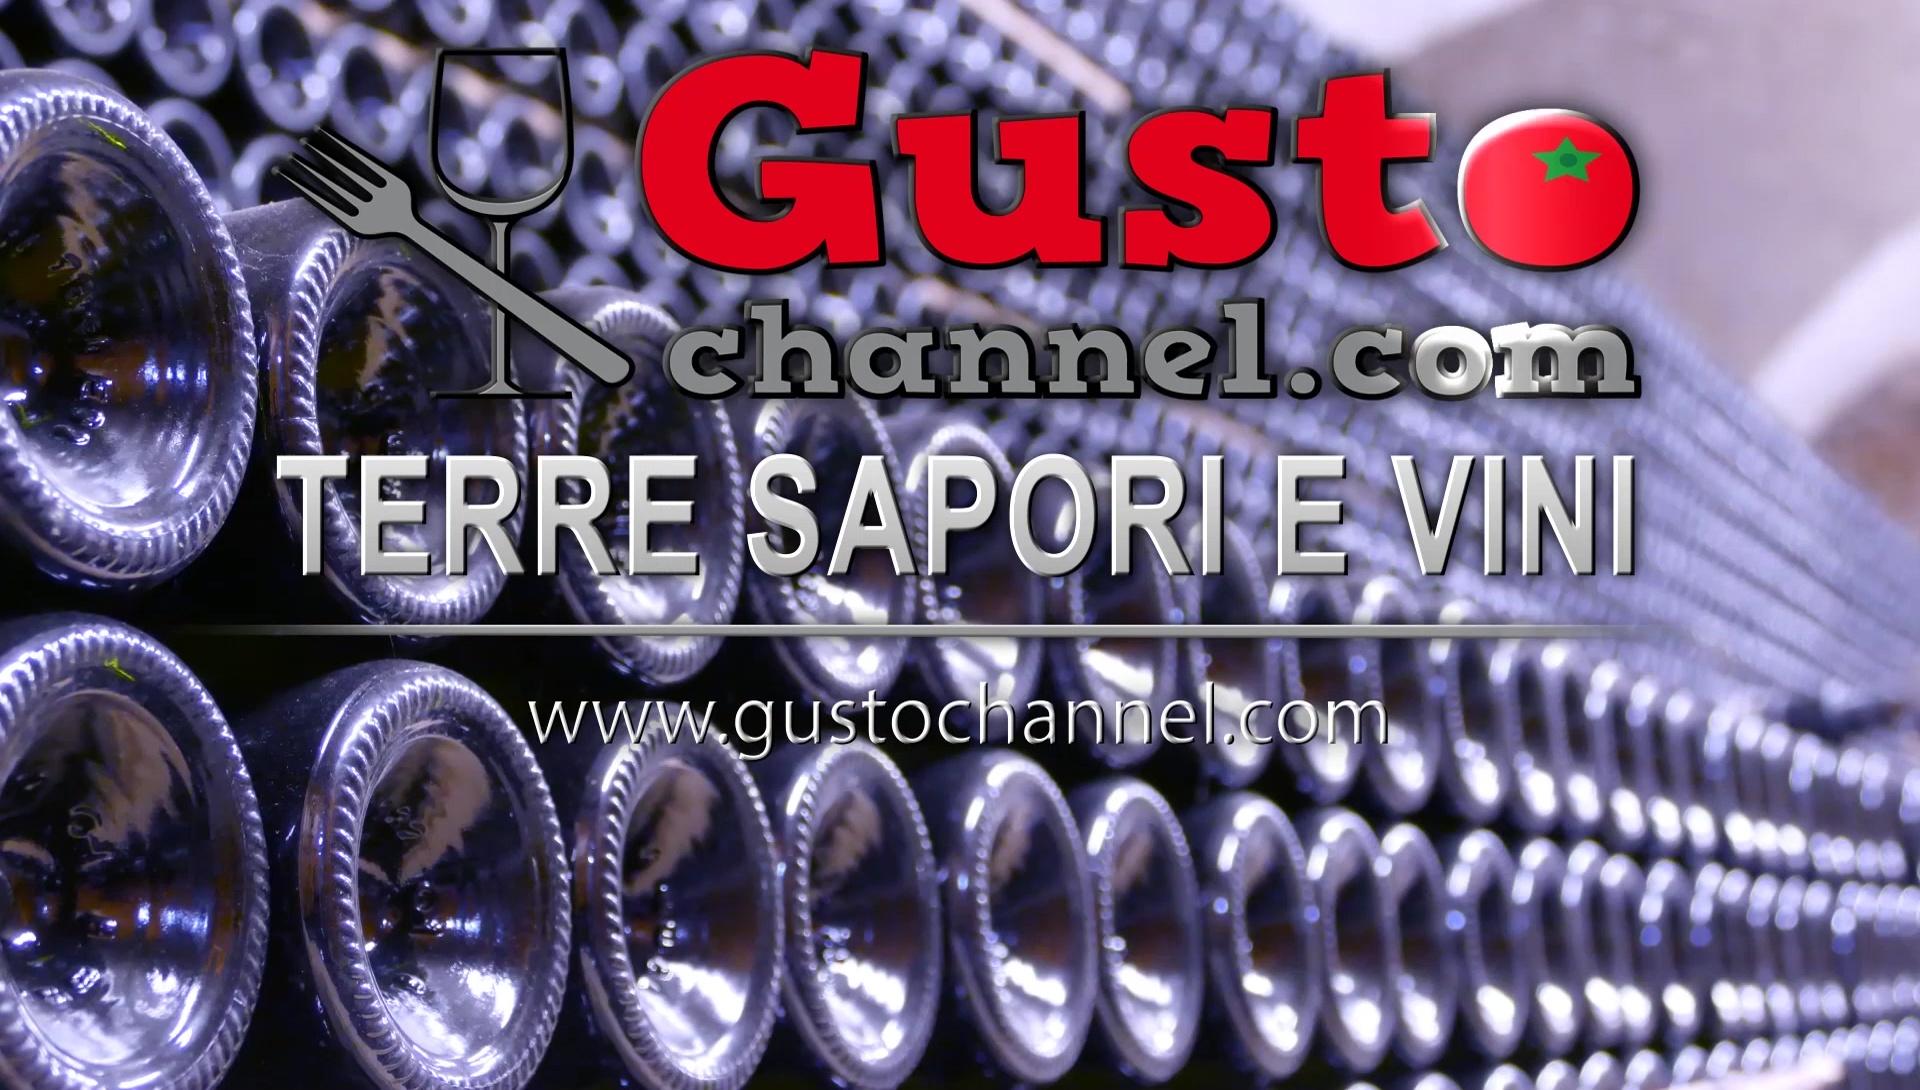 Gustochannel Nuovo Studio Virtuale